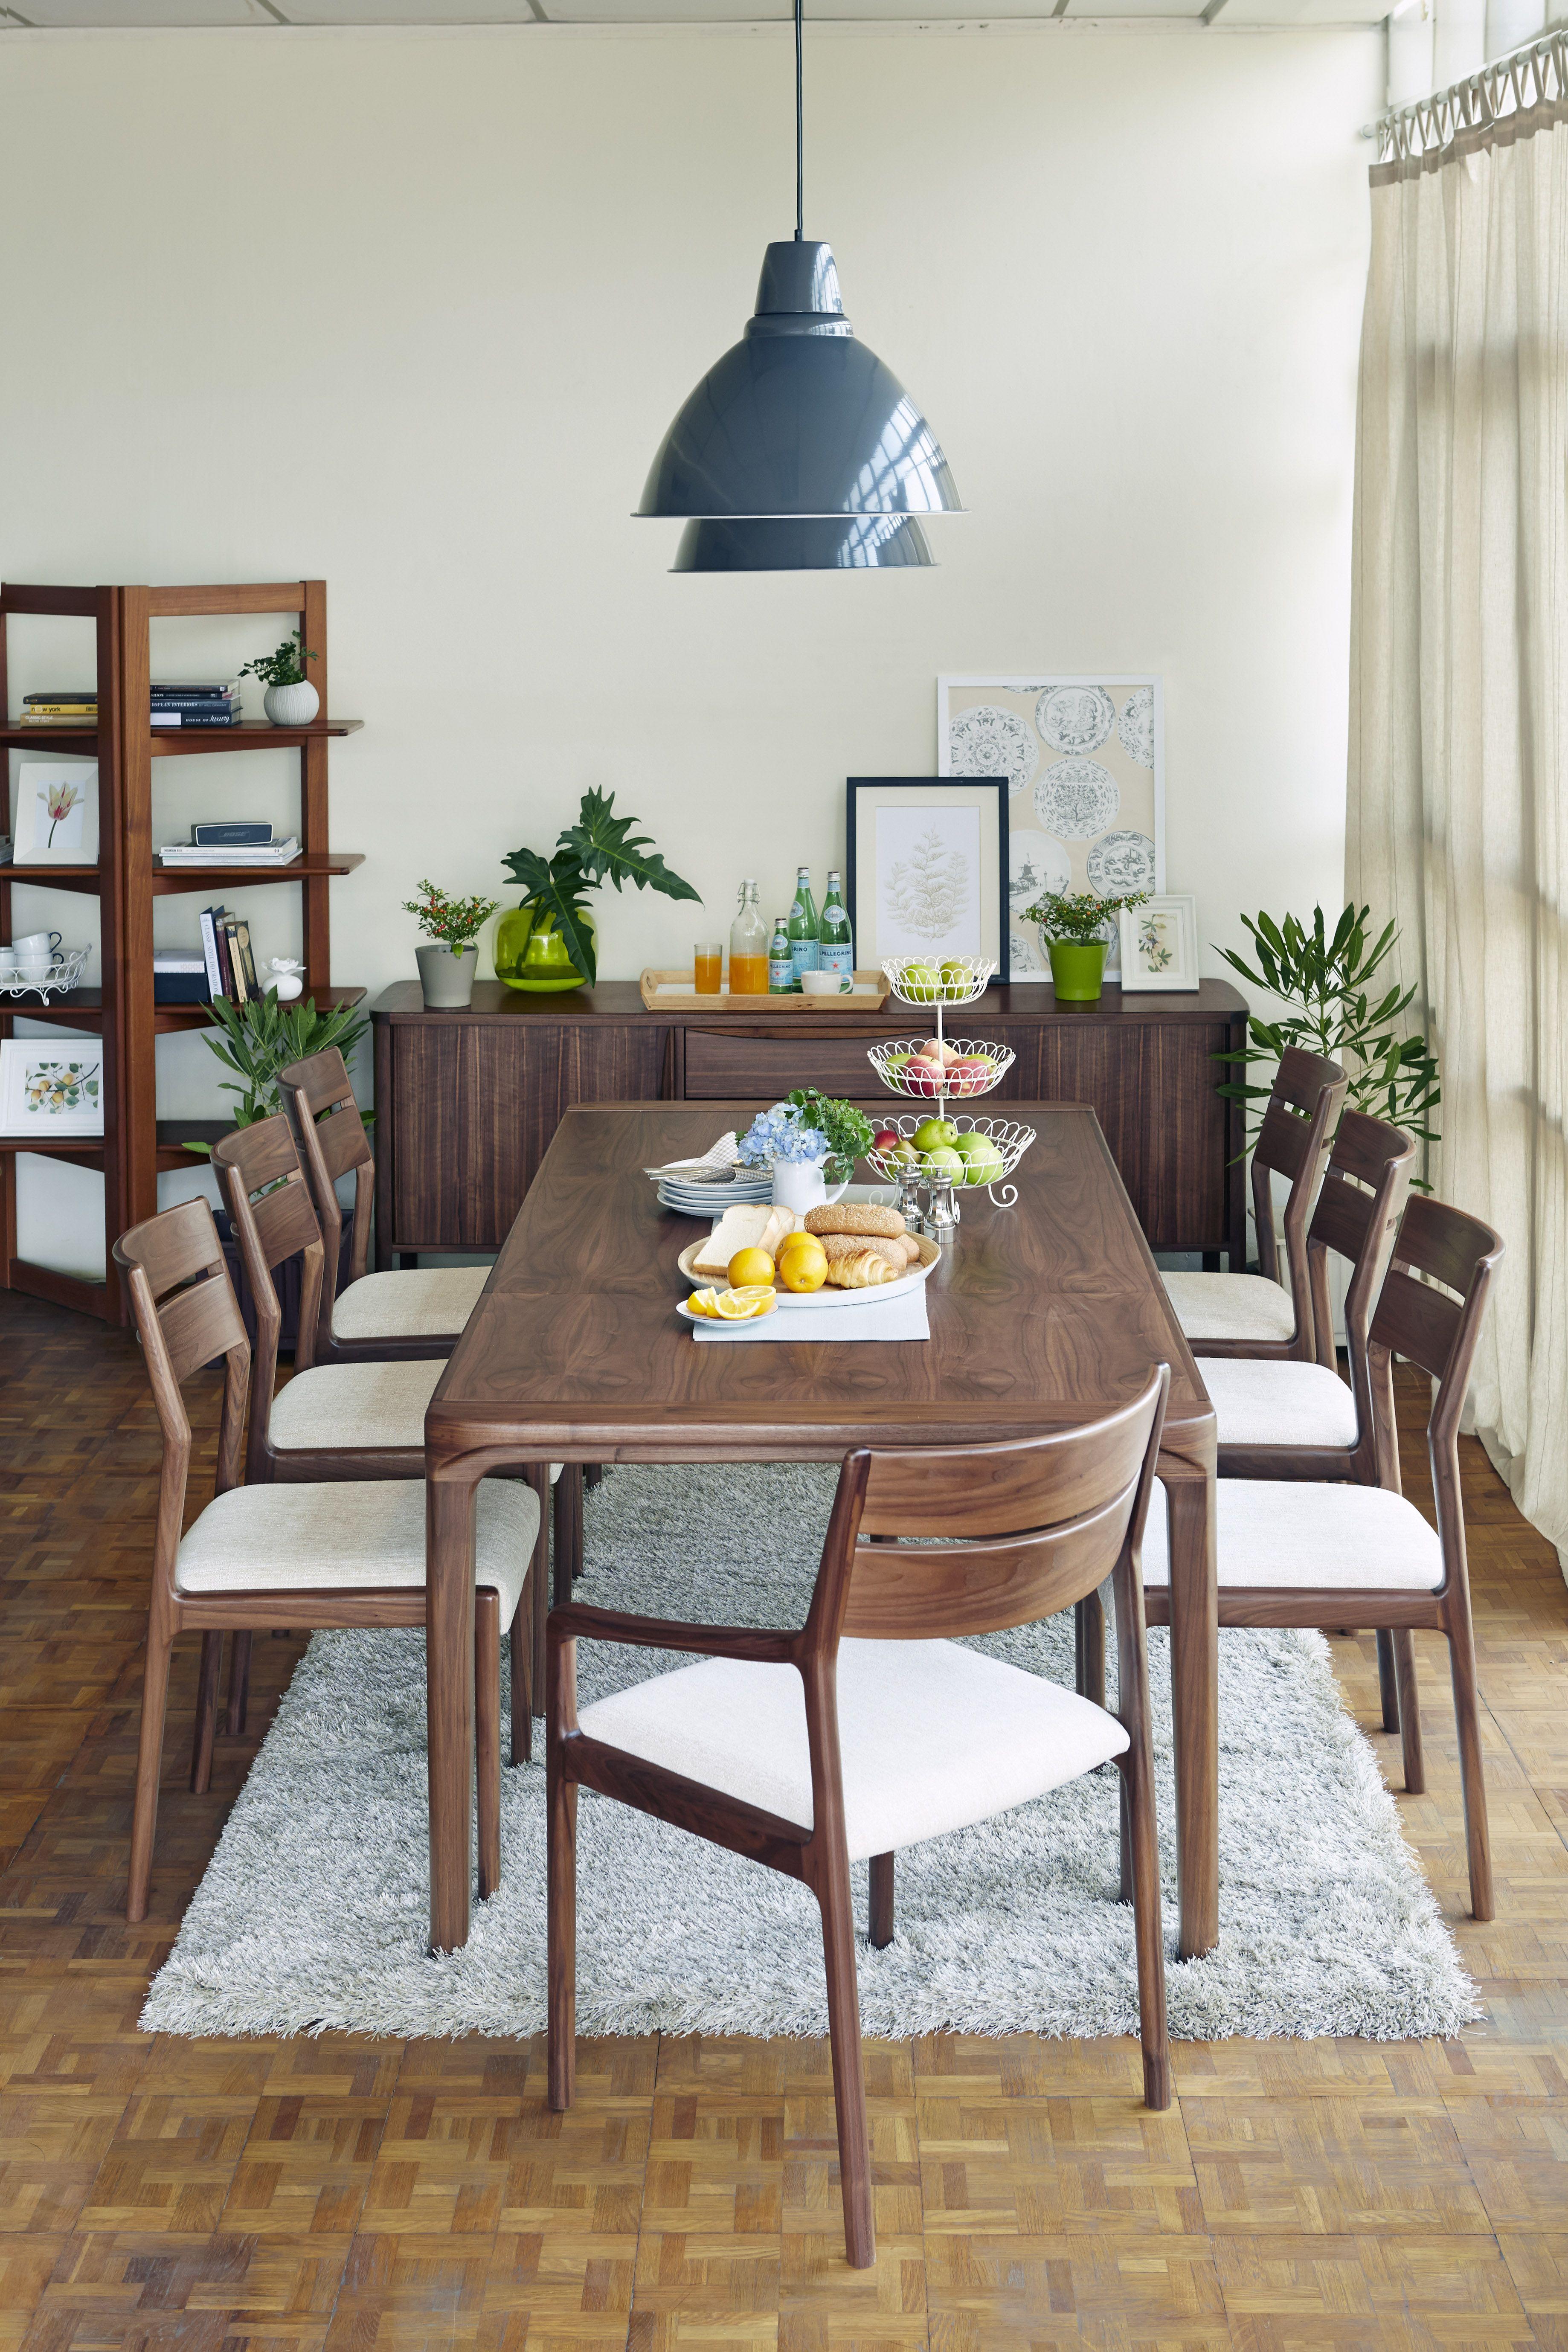 Fs18 House Of Denmark Dining Room Small Dinner Tables Furniture Dining Room Furniture Modern #walnut #living #room #furniture